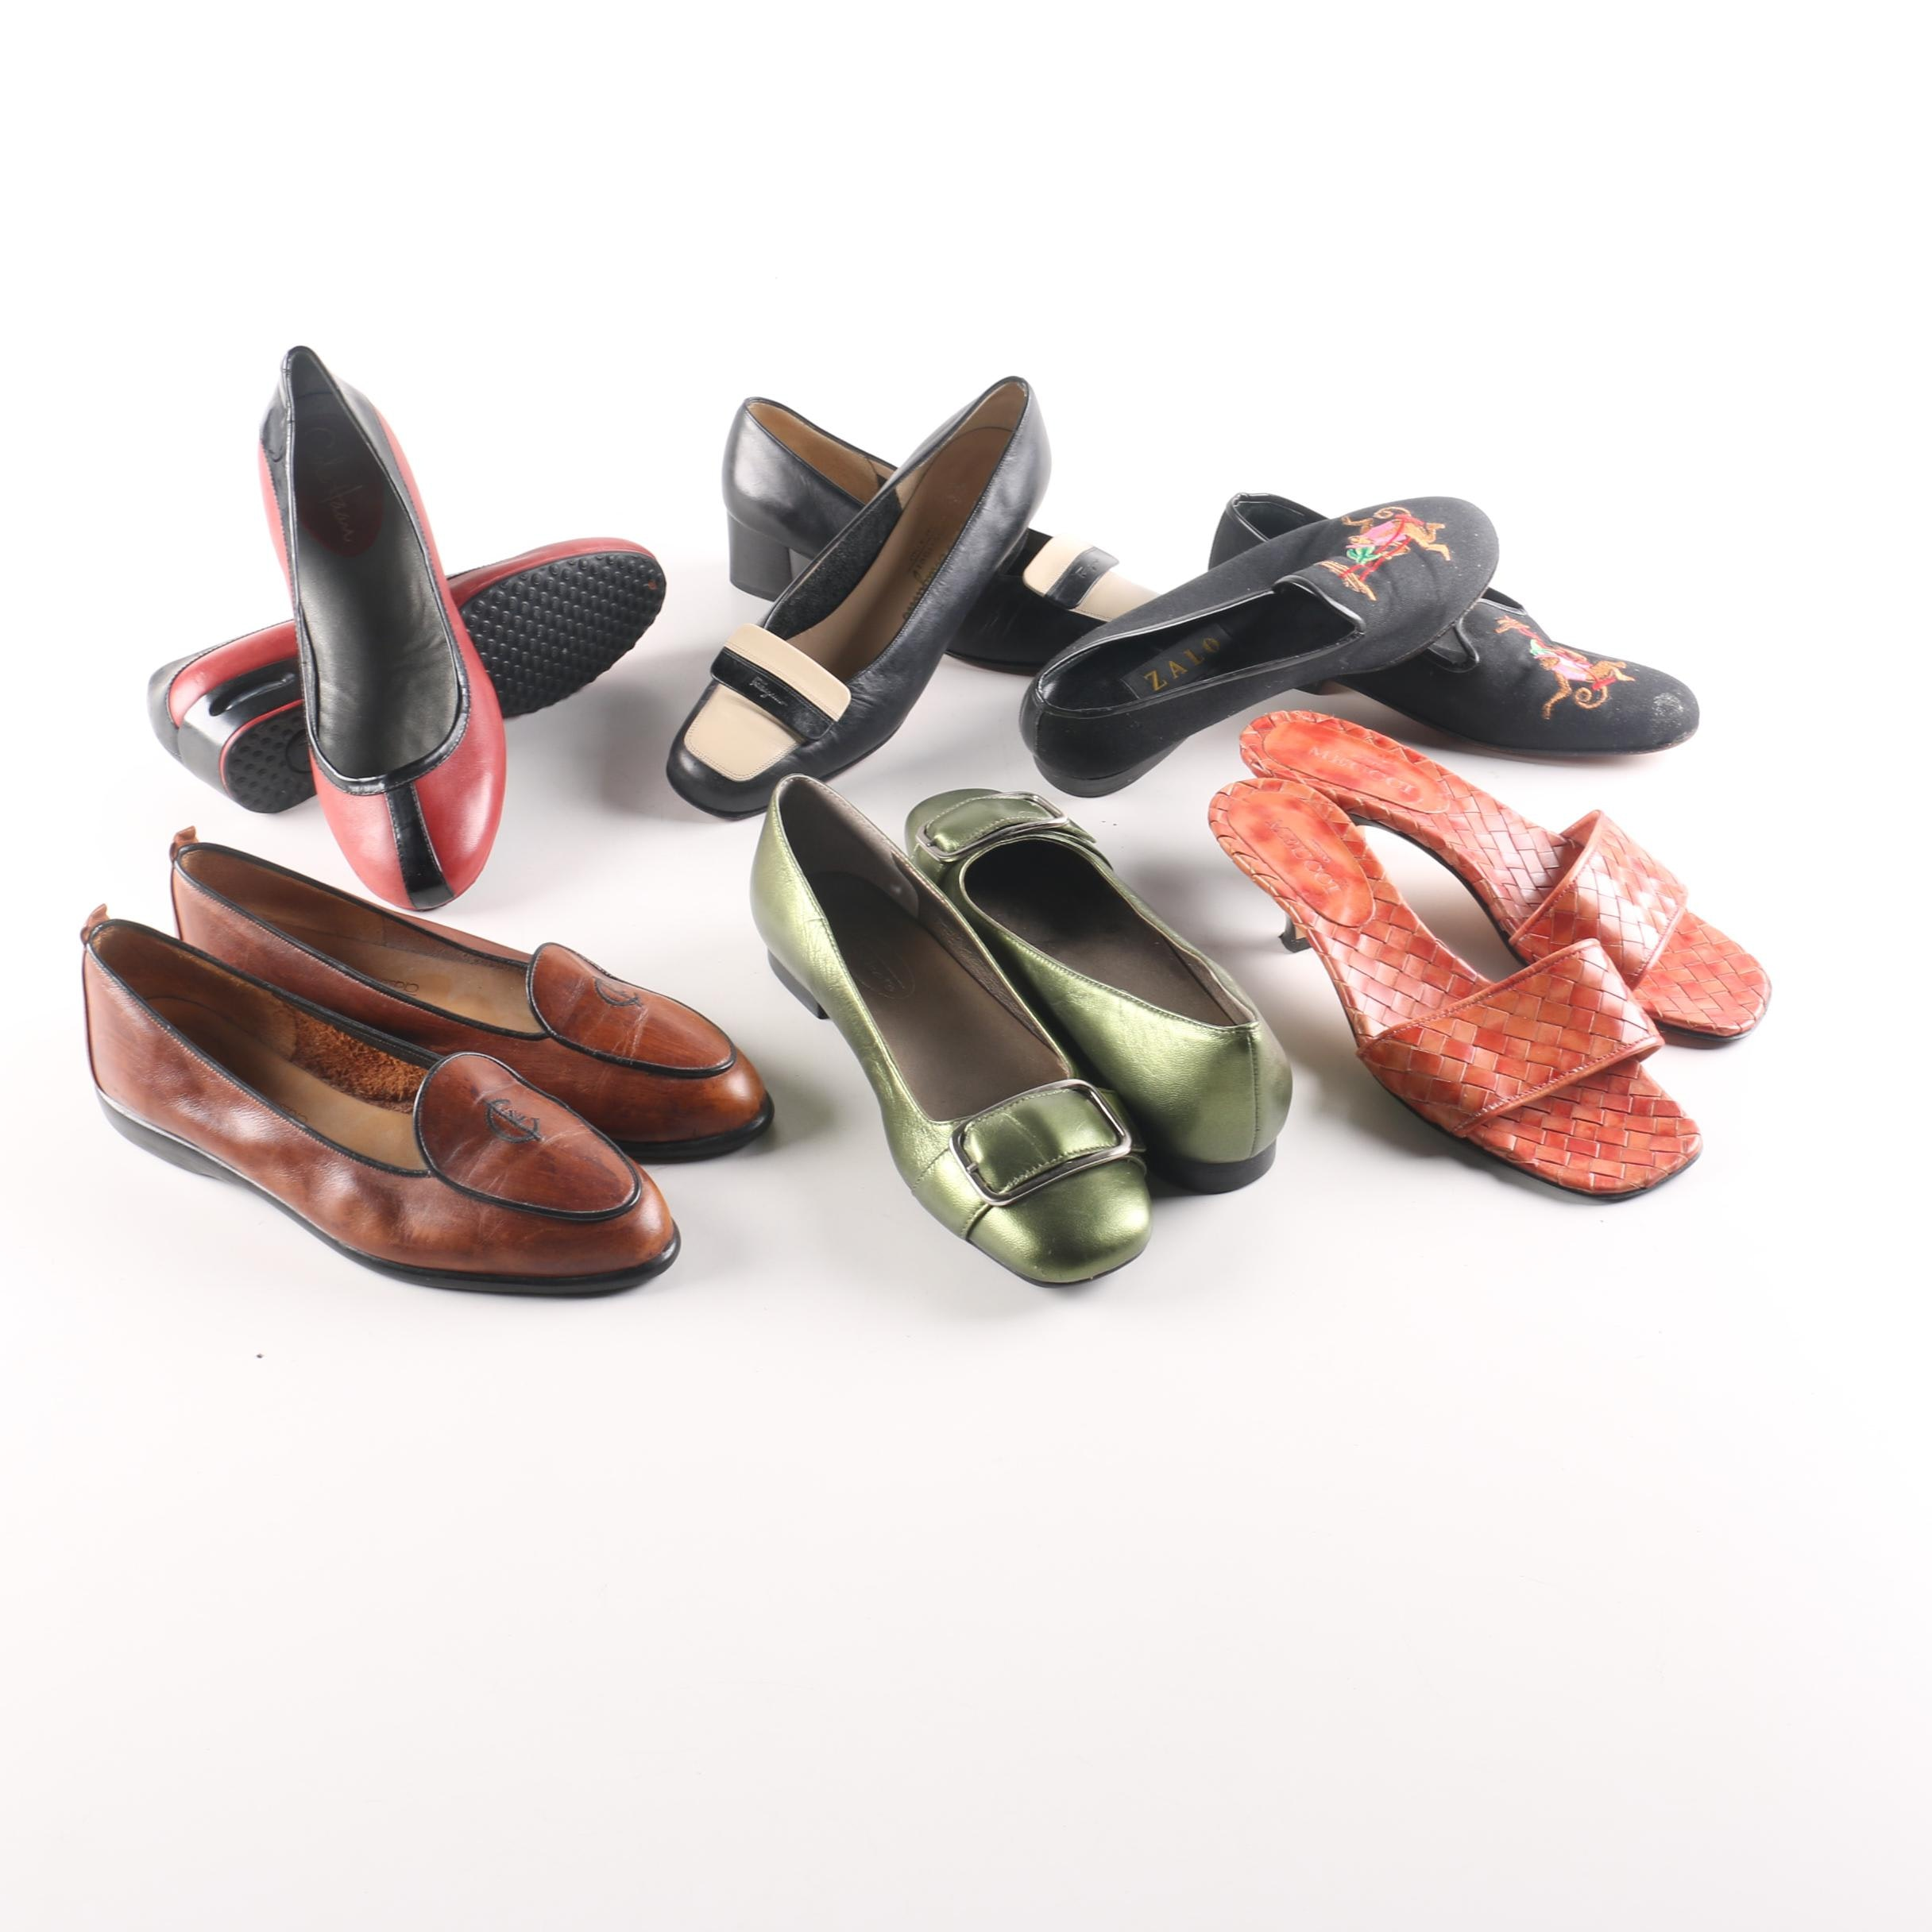 Women's Shoes Including Calvin Klein and Salvatore Ferragamo